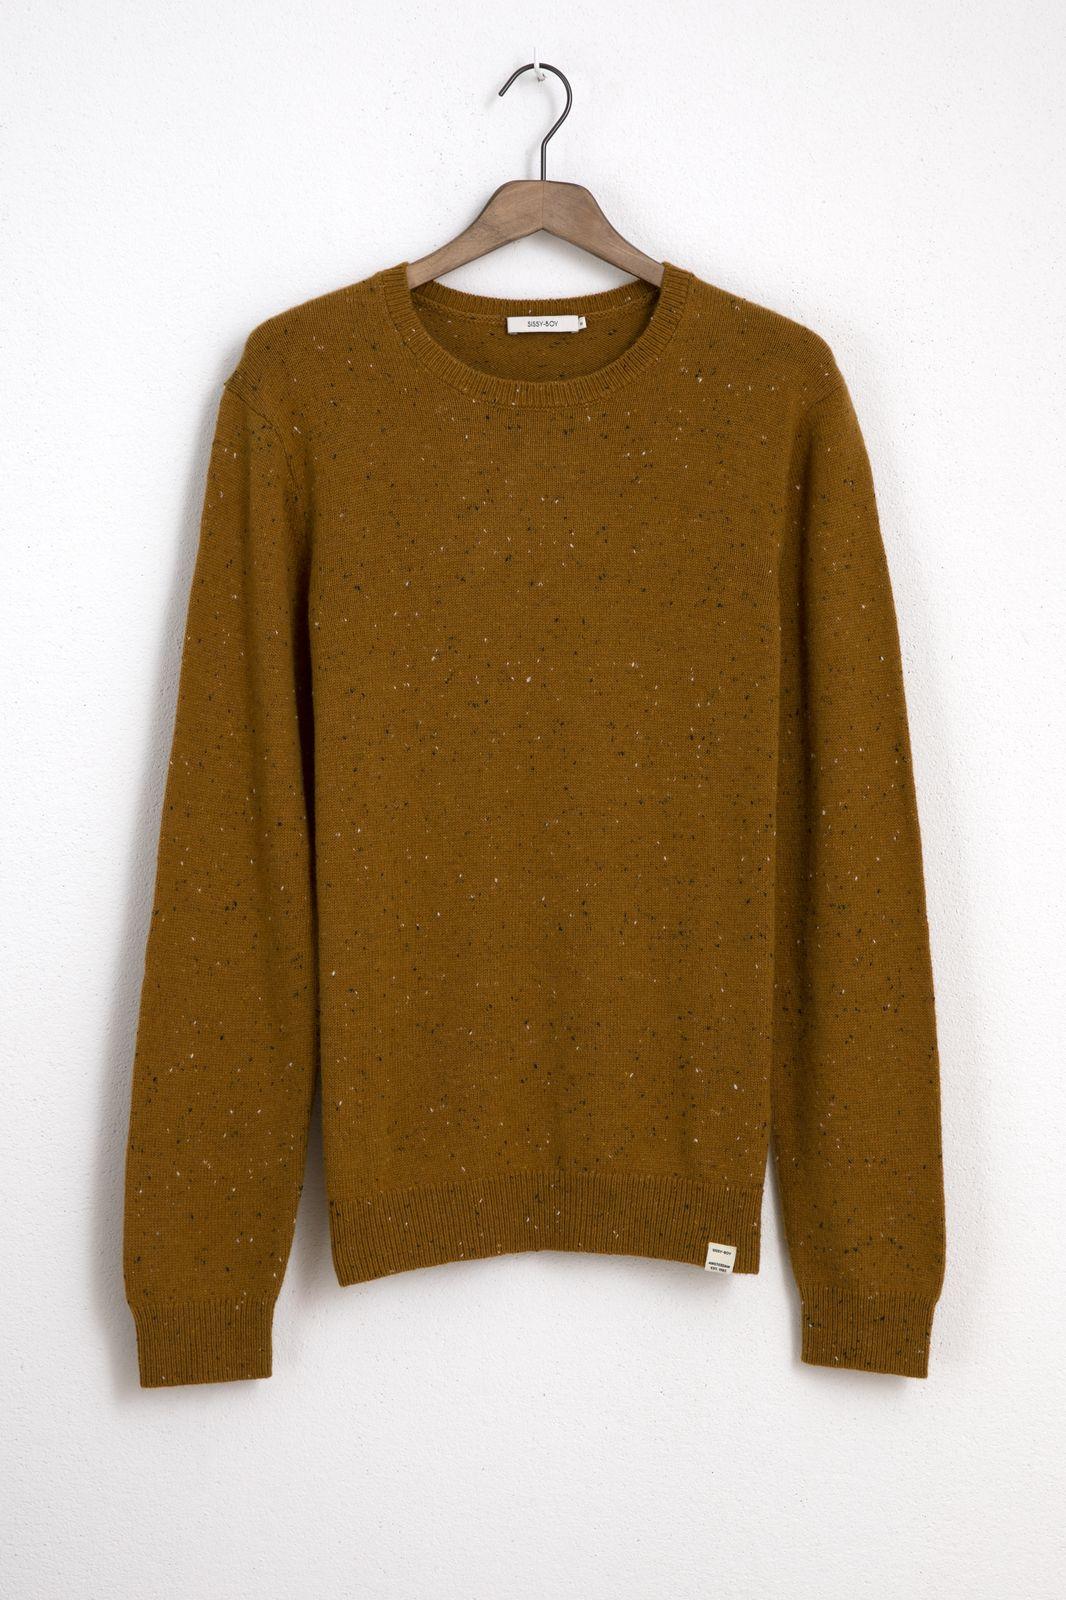 Mosterdgele trui met gebreide details